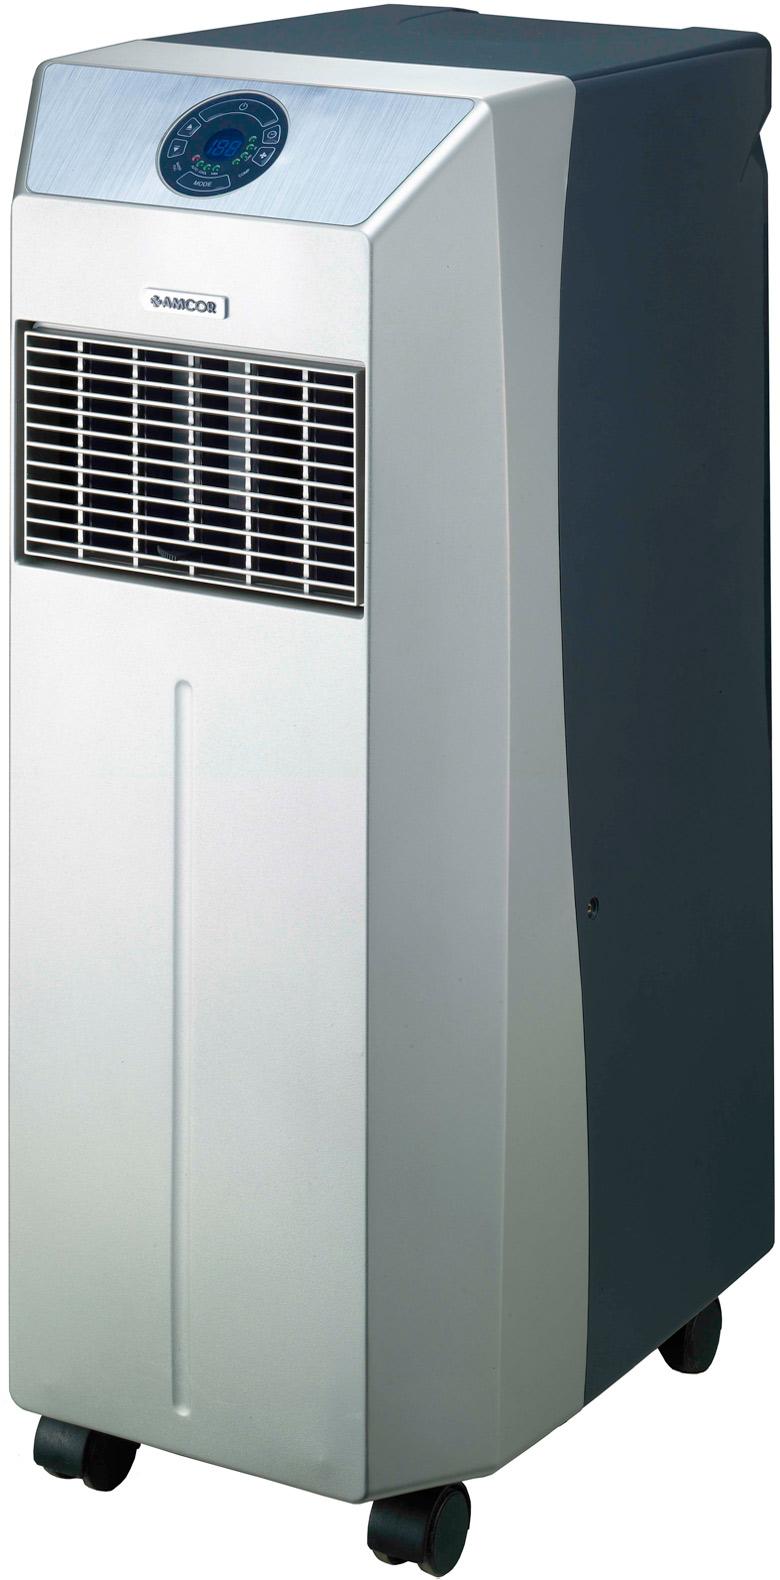 Nanomaxc14000e s 14000 btu nanomax portable air for 18000 btu window ac units